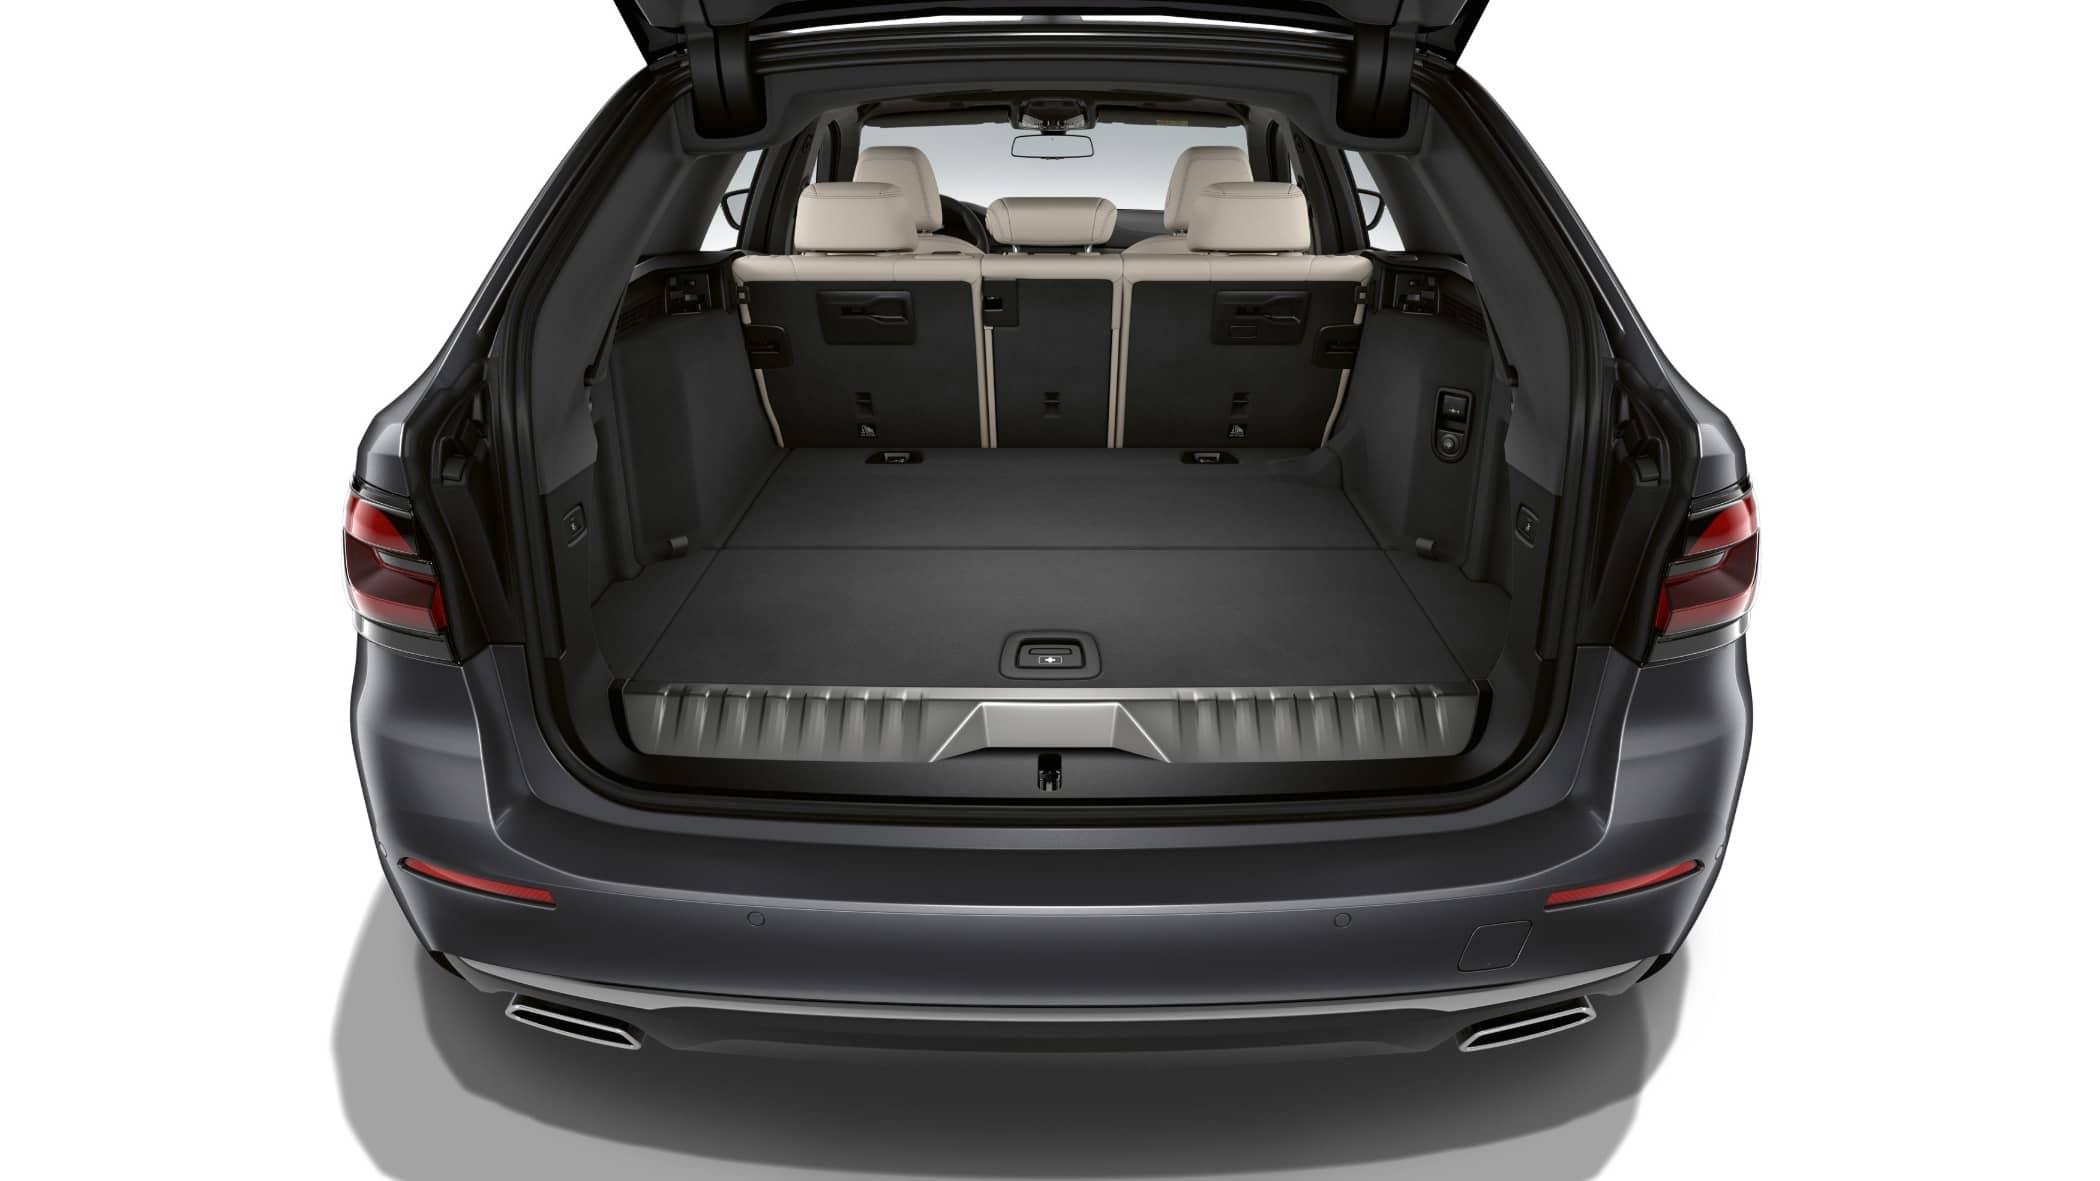 Personal luxury car, Automotive design, Land vehicle, Trunk